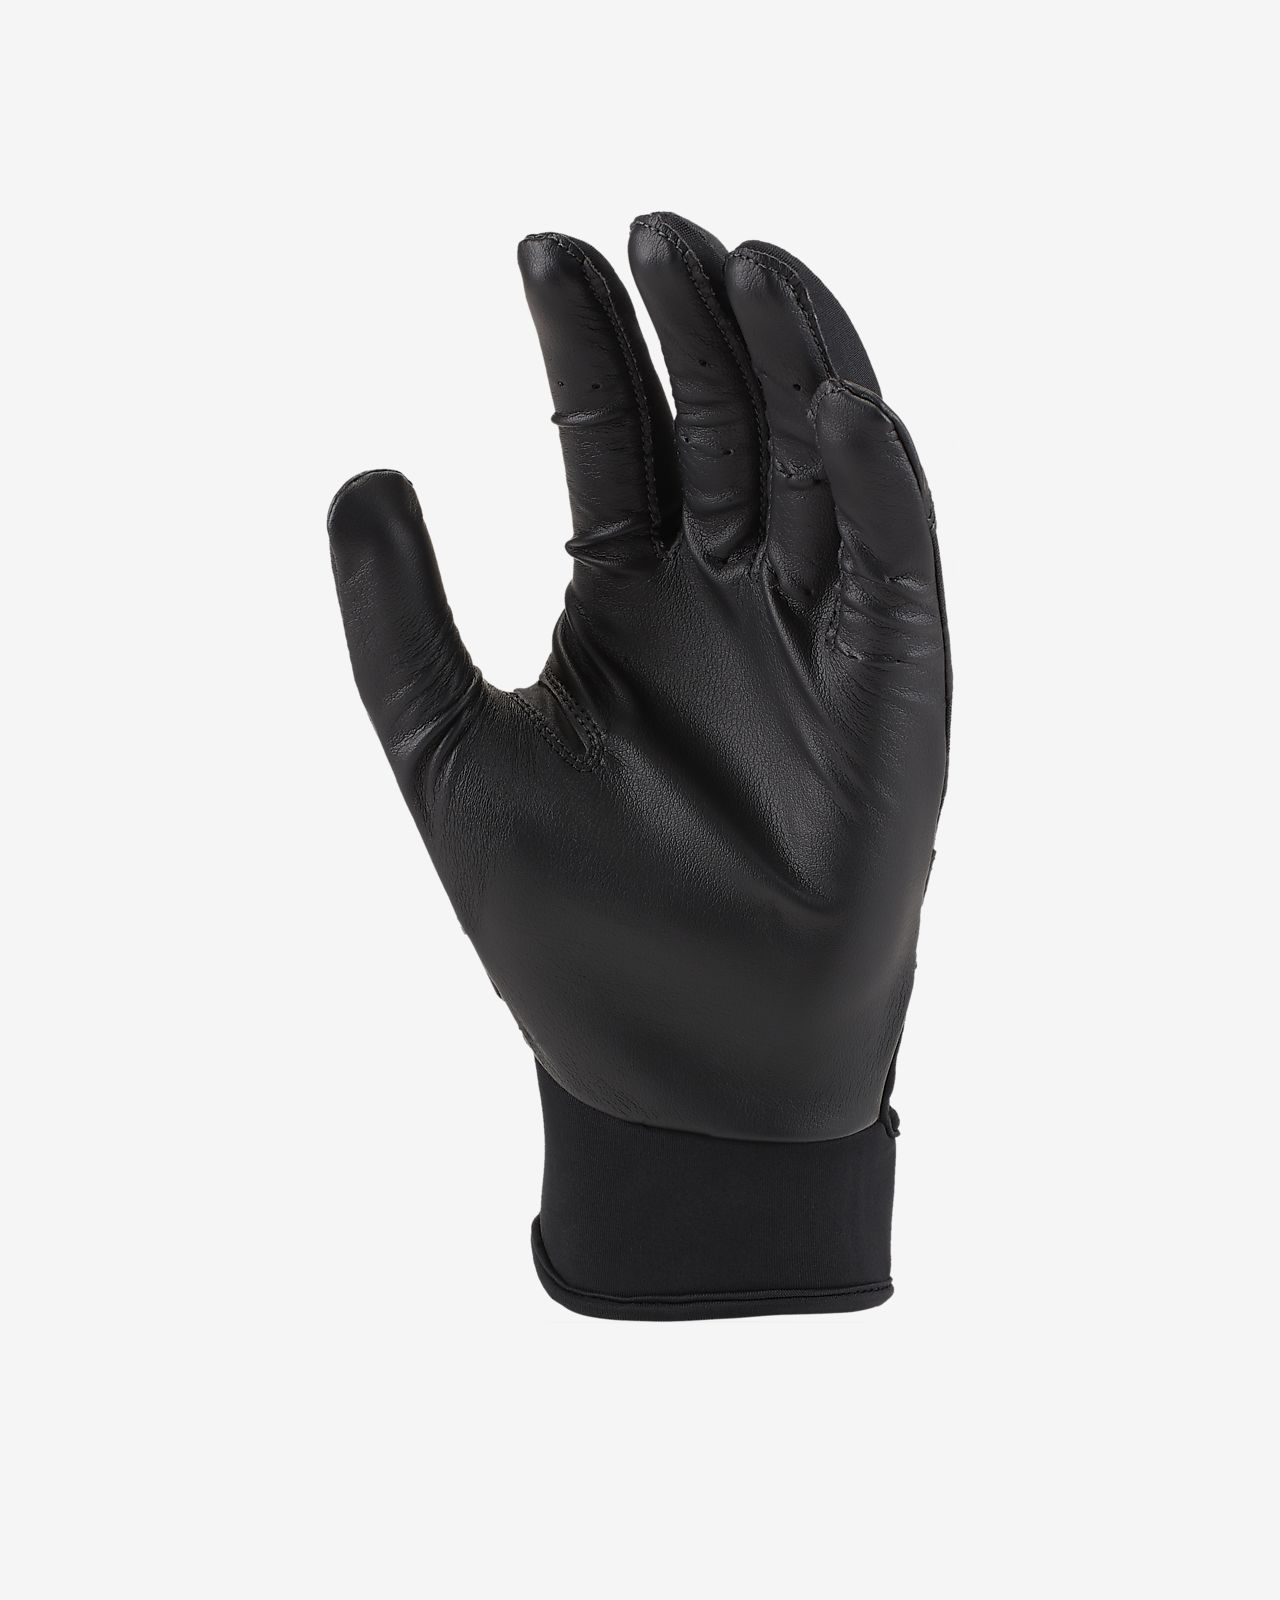 Nike Huarache Edge Baseball Gloves